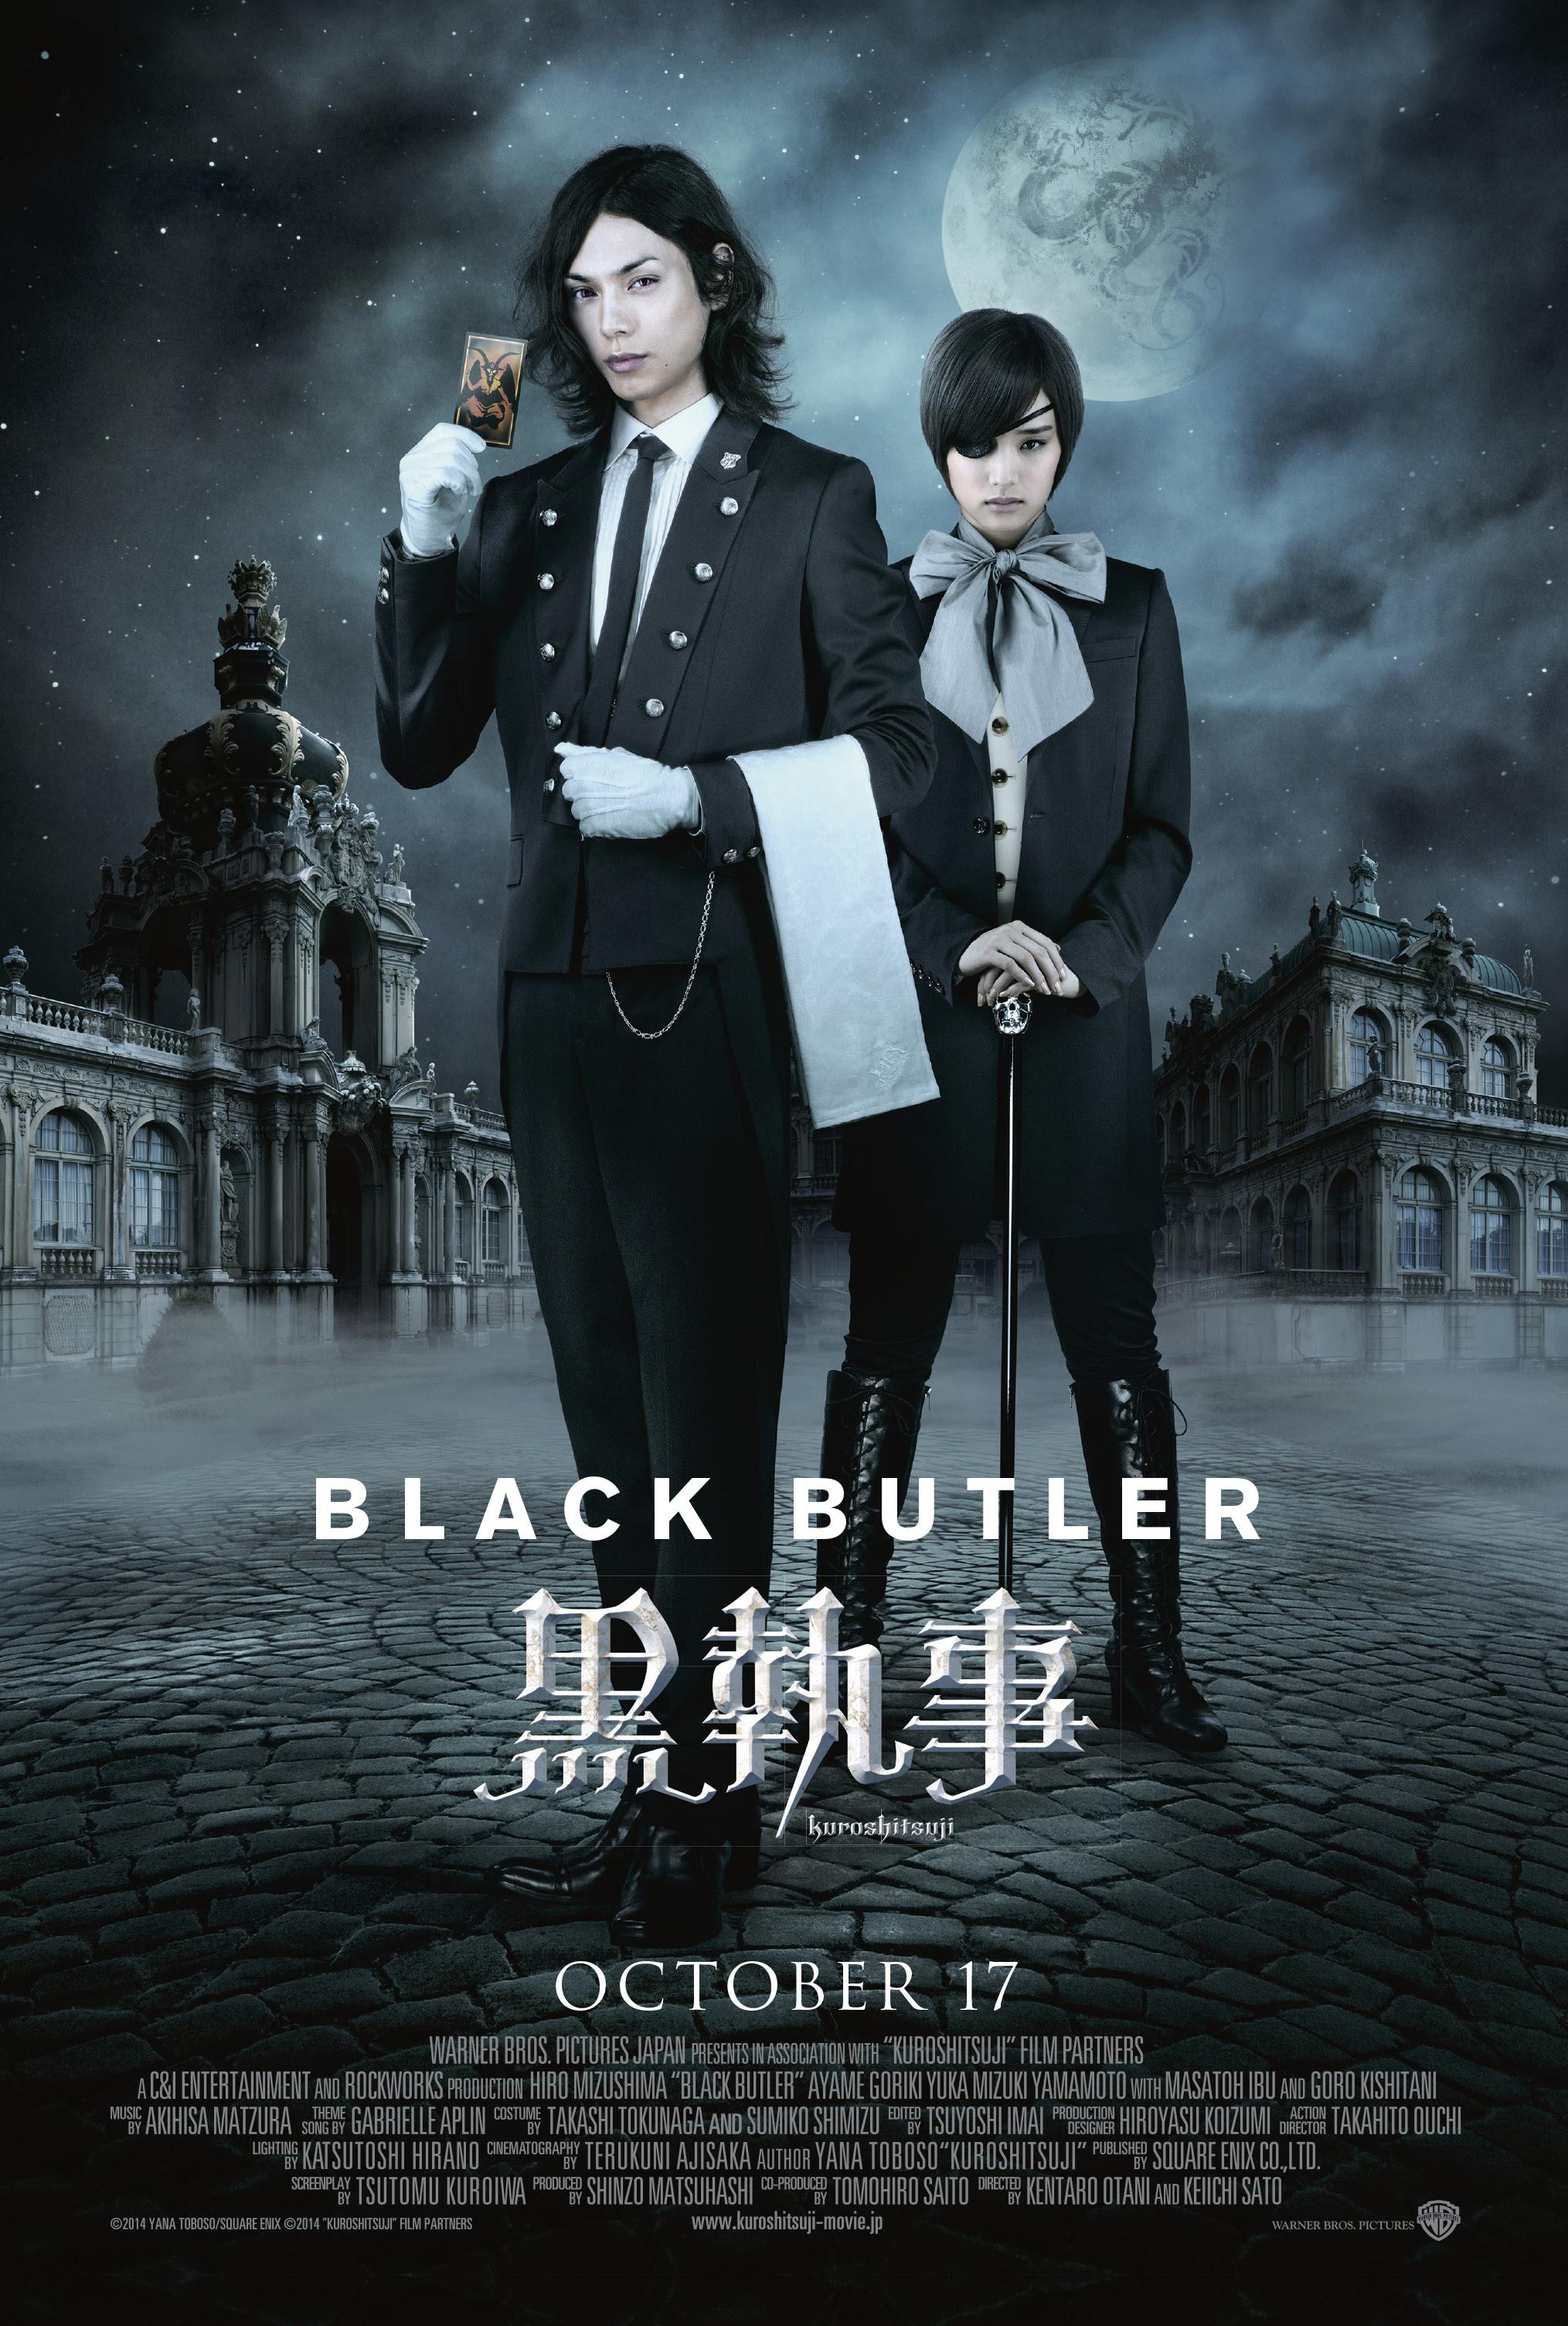 Black butler season 3 release date in Australia